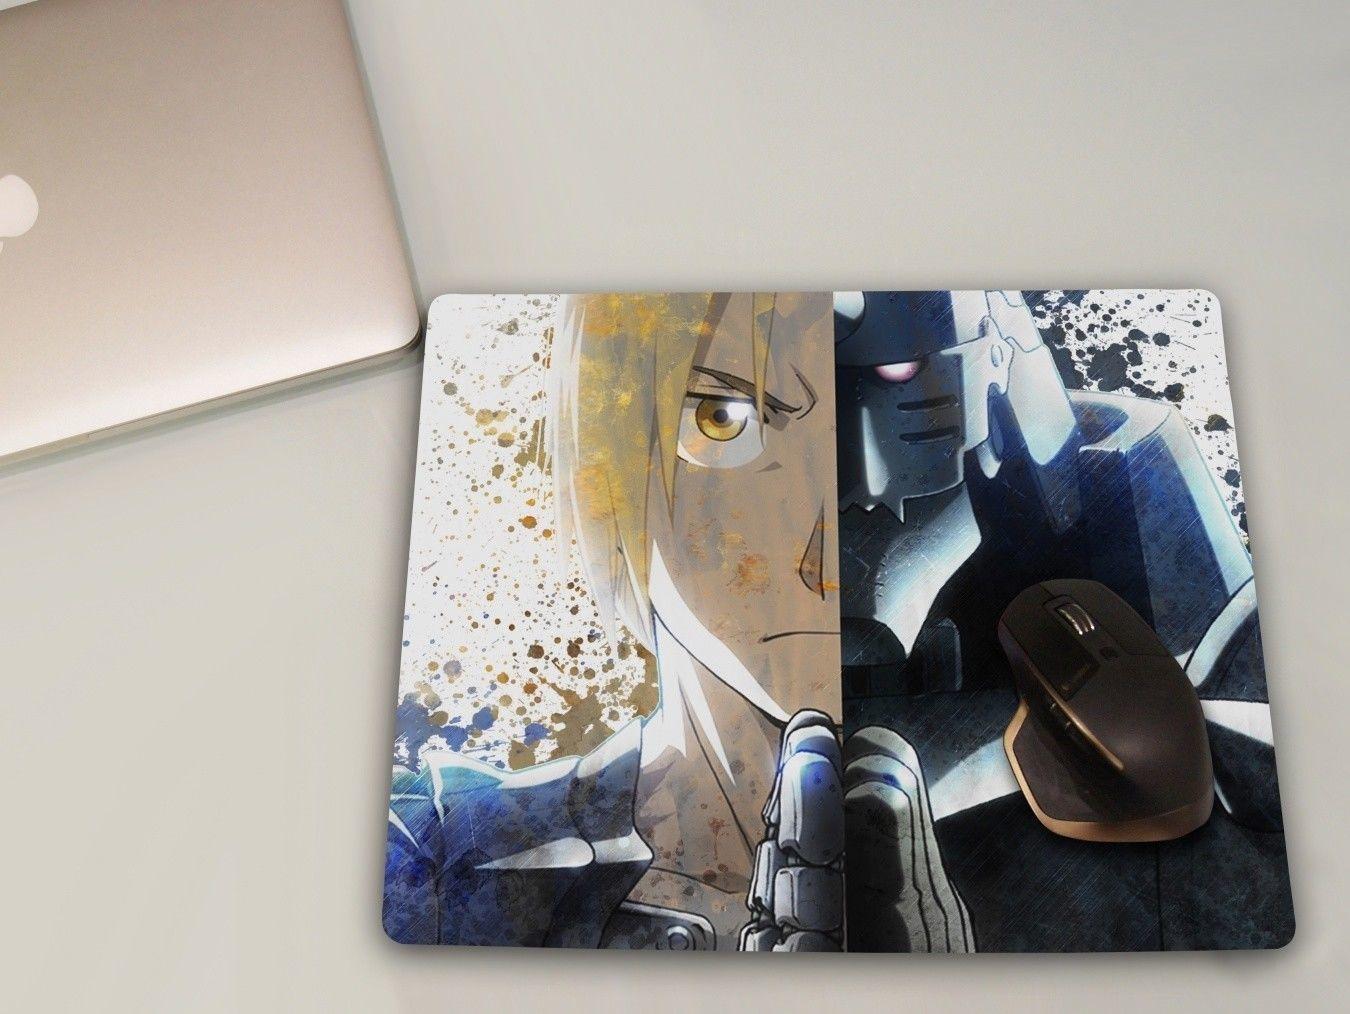 Fullmetal Alchemist Anime Mousepad Large Gaming Mouse Mat